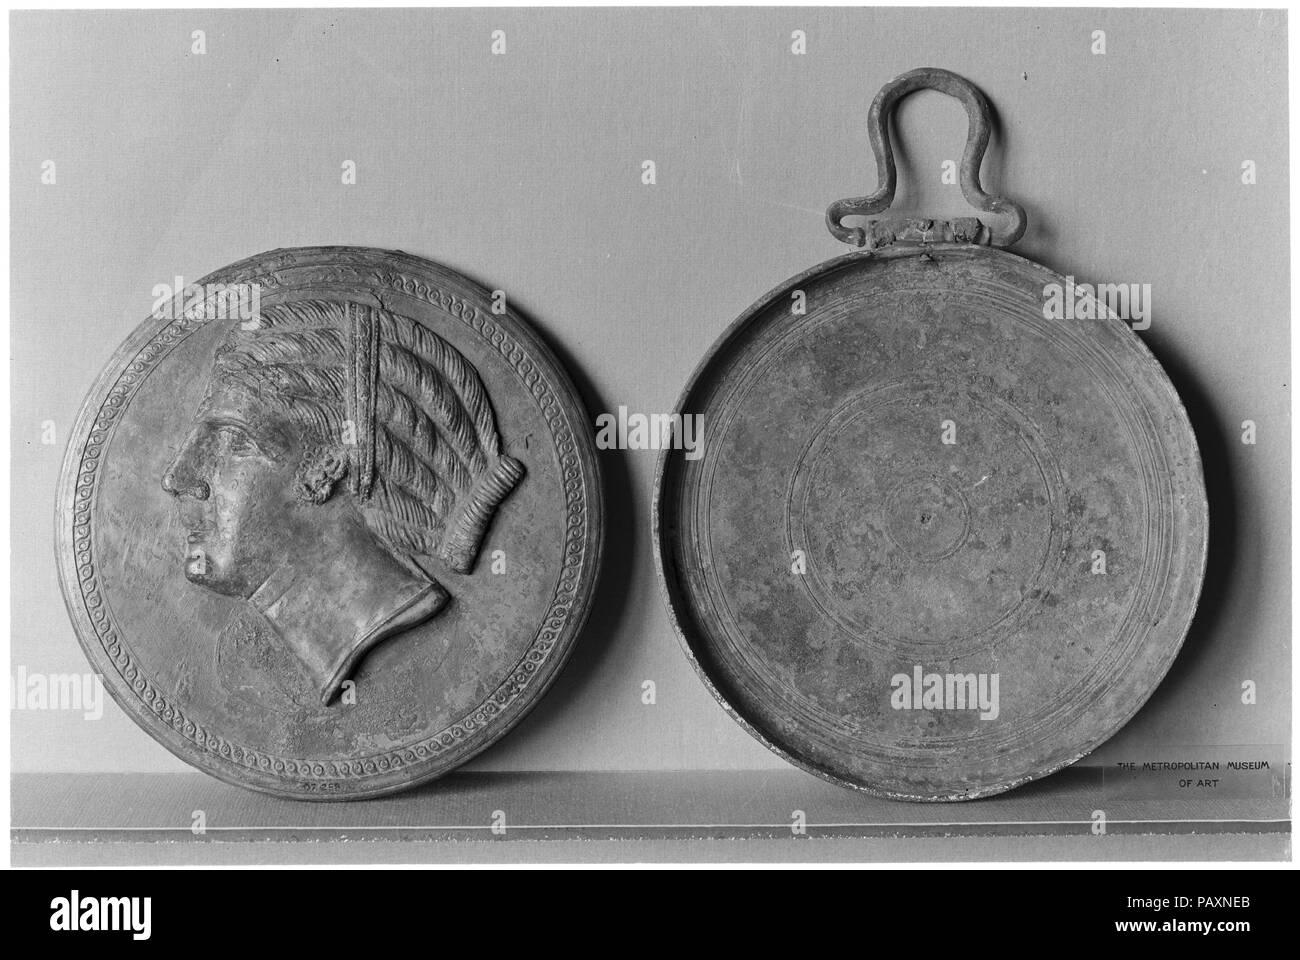 Bronze box mirror. Culture: Greek. Dimensions: diameter  6 1/4in. (15.8cm). Date: mid-4th century B.C..  In relief, head of woman. Museum: Metropolitan Museum of Art, New York, USA. - Stock Image